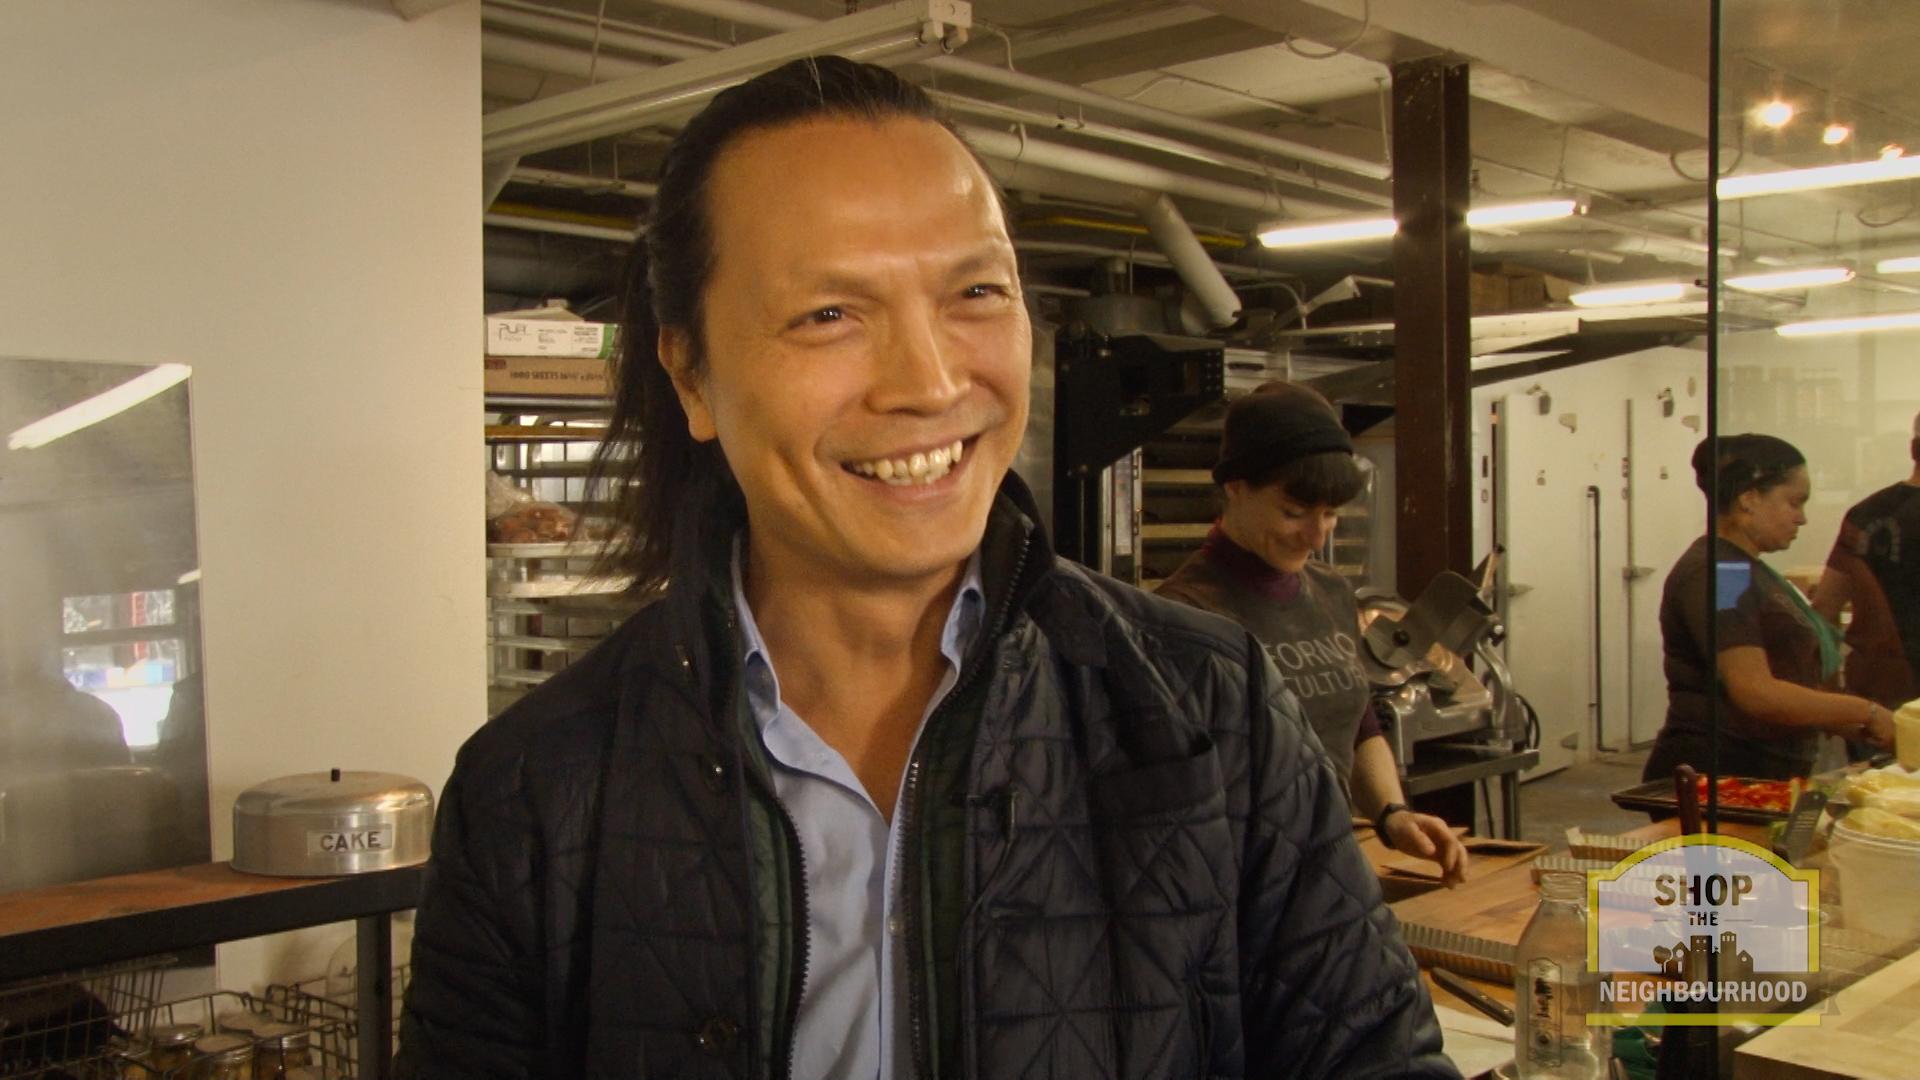 08_STN - Susur Lee - Acclaimed Iron Chef_LONG.mov.00_00_32_22.Still004.jpg